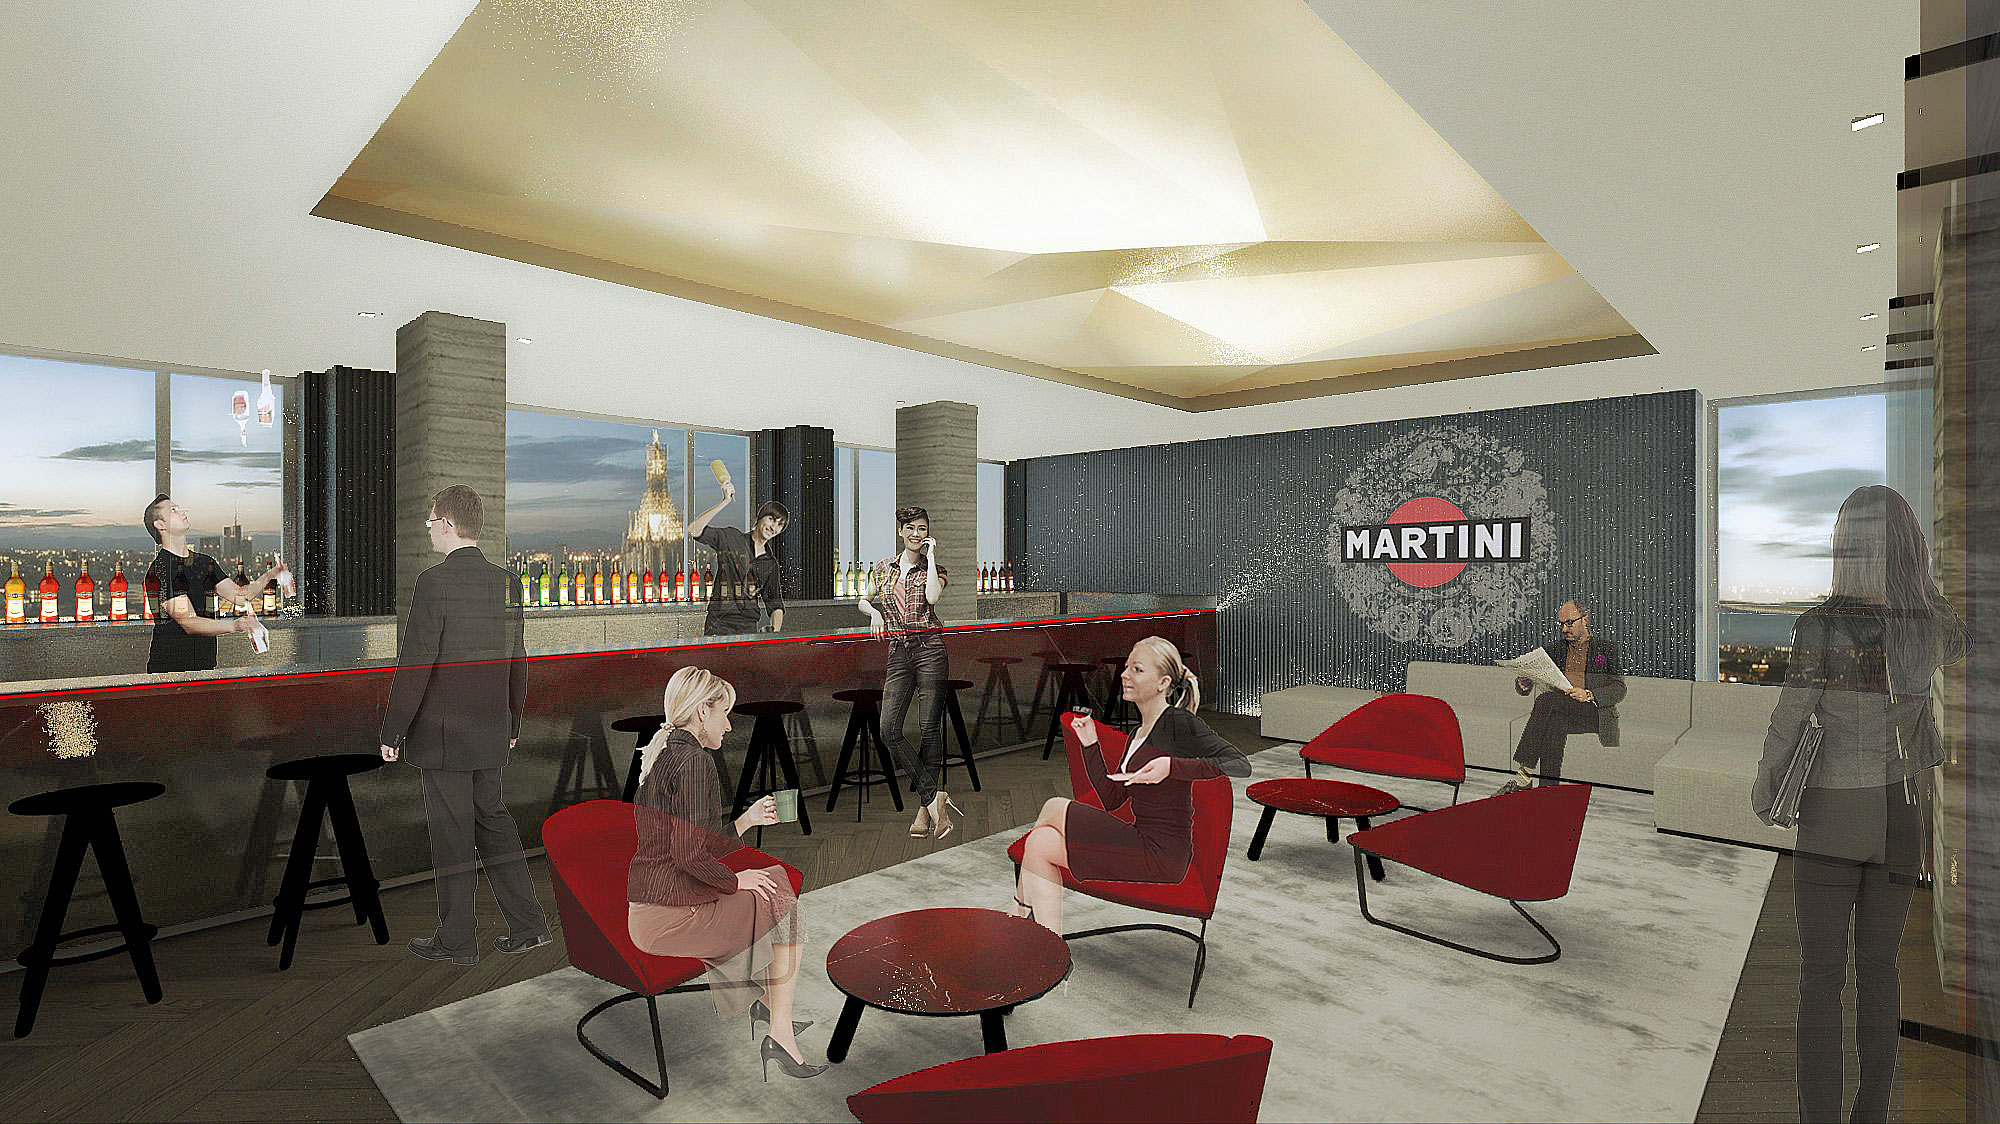 <strong>Terrazza Martini<span><b>view larger</b></span></strong><i>→</i>